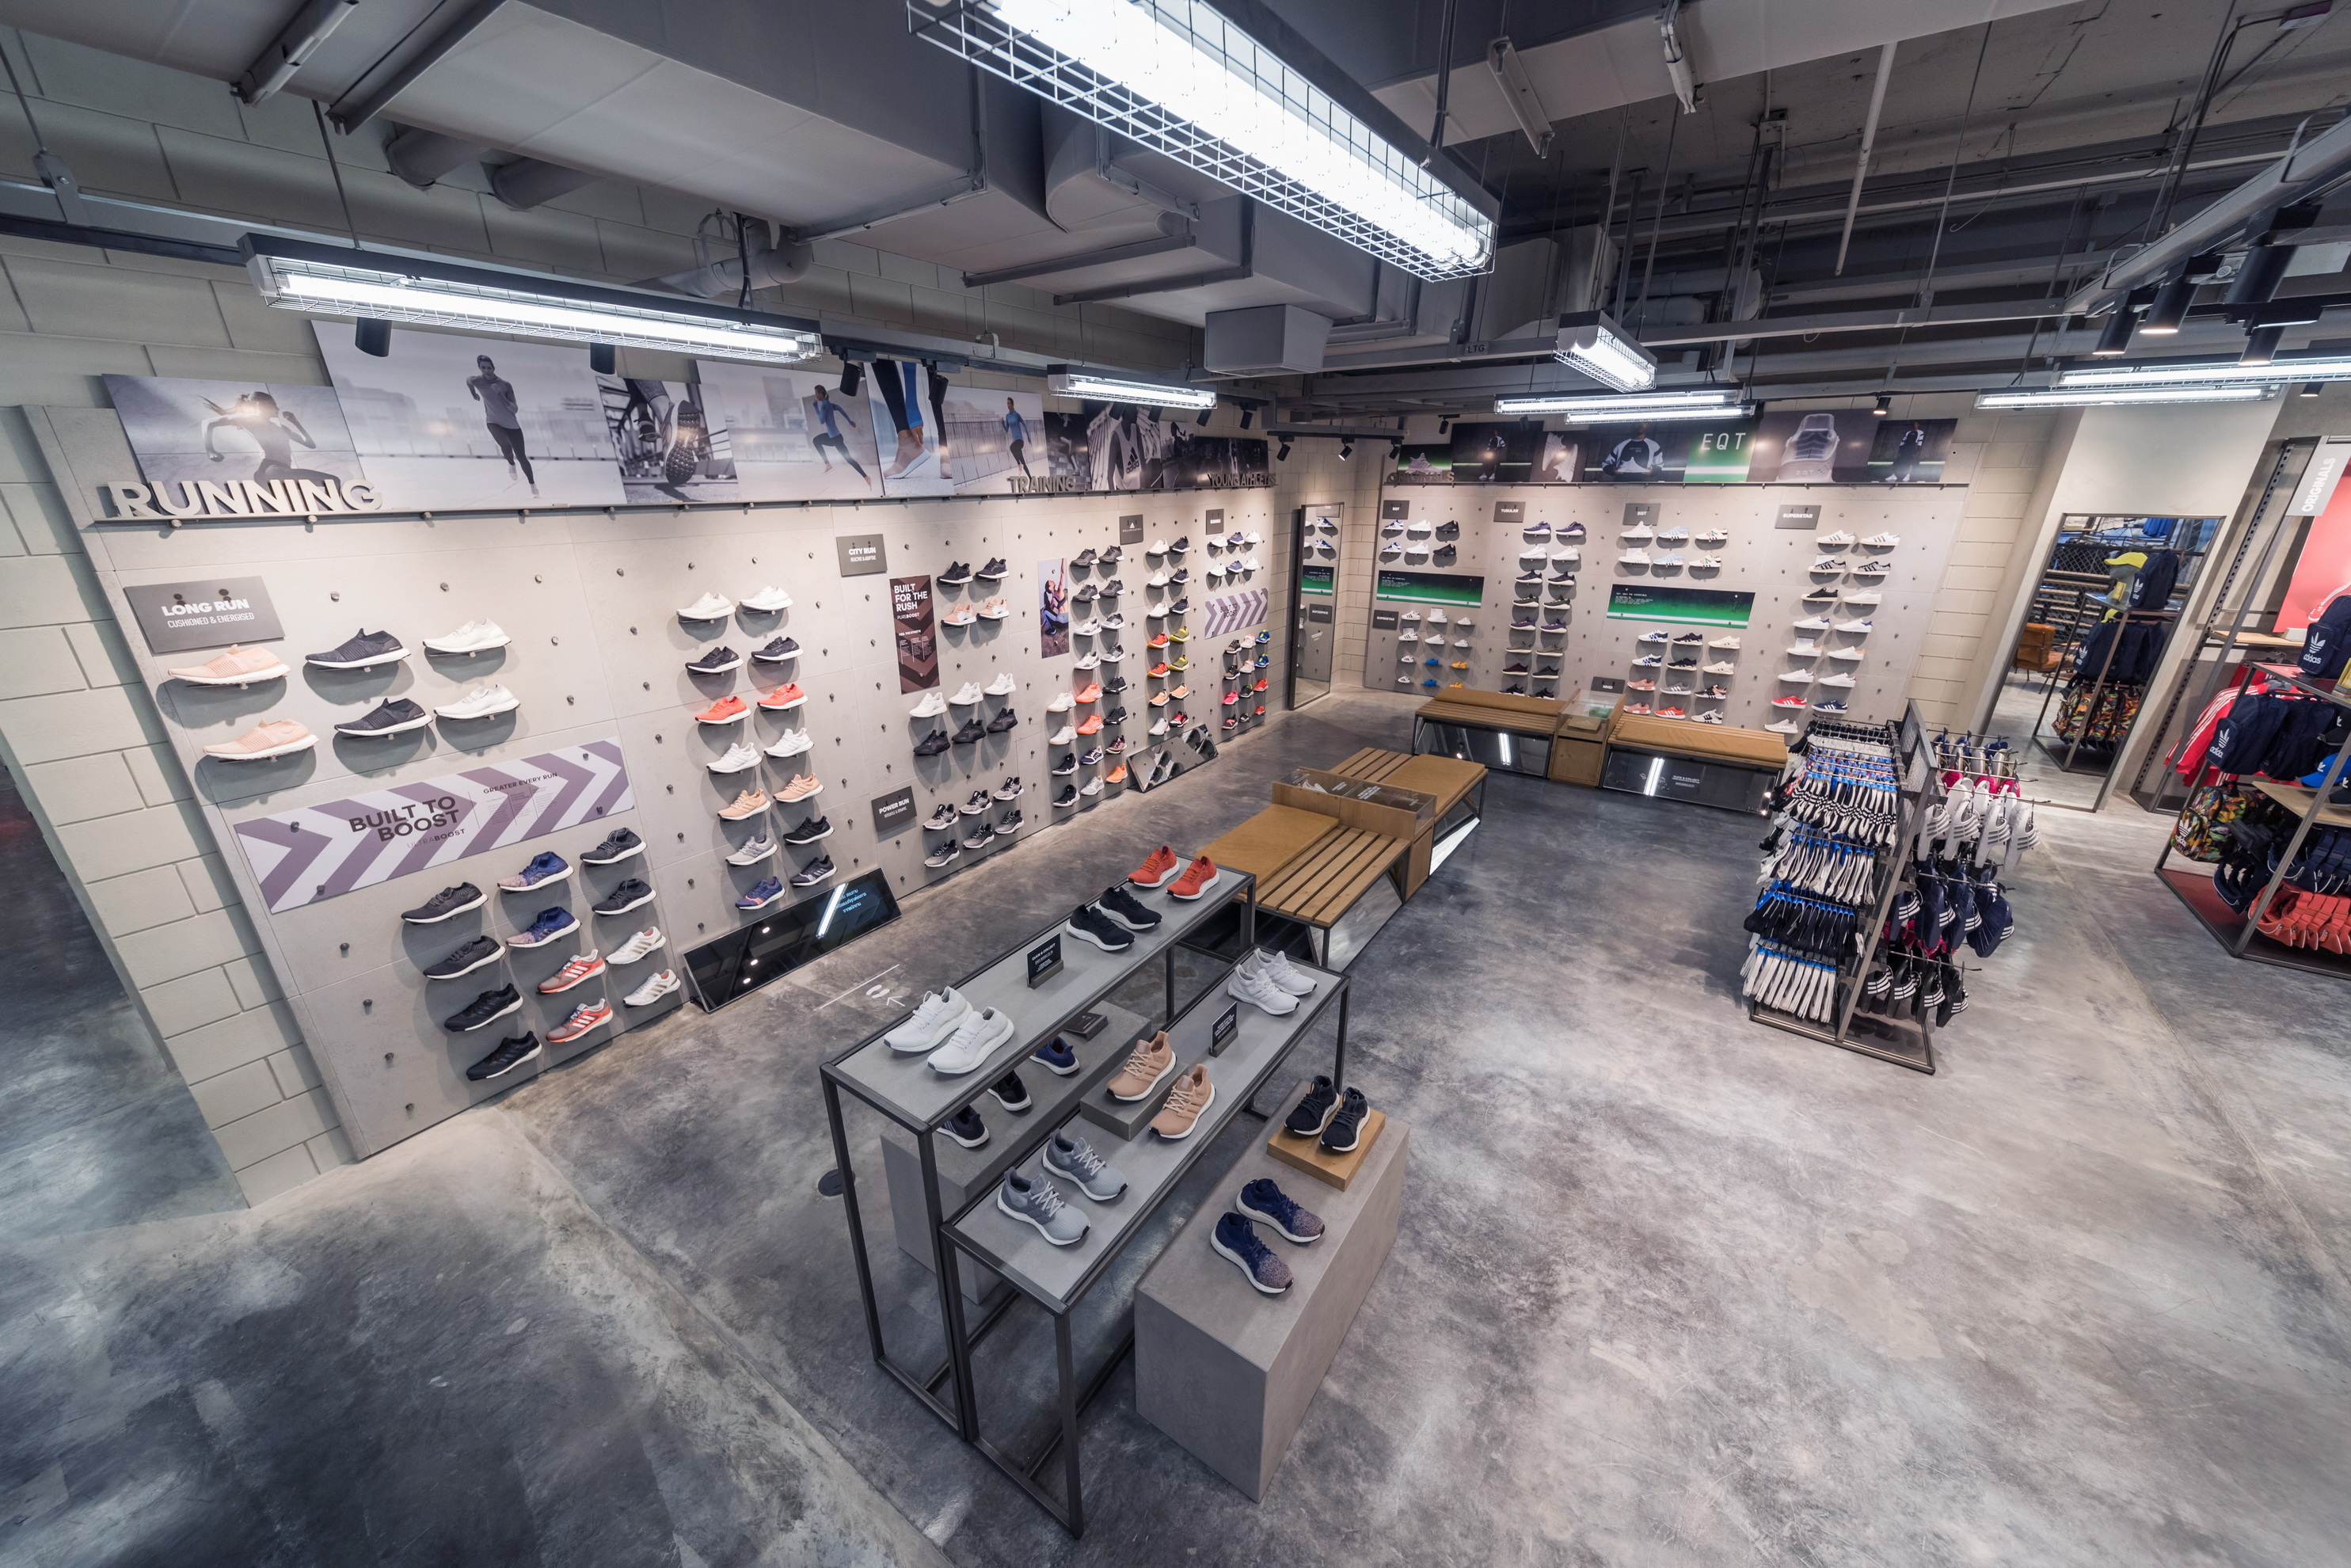 Adidas Shop - ผนังตกแต่ง - Decorative wa